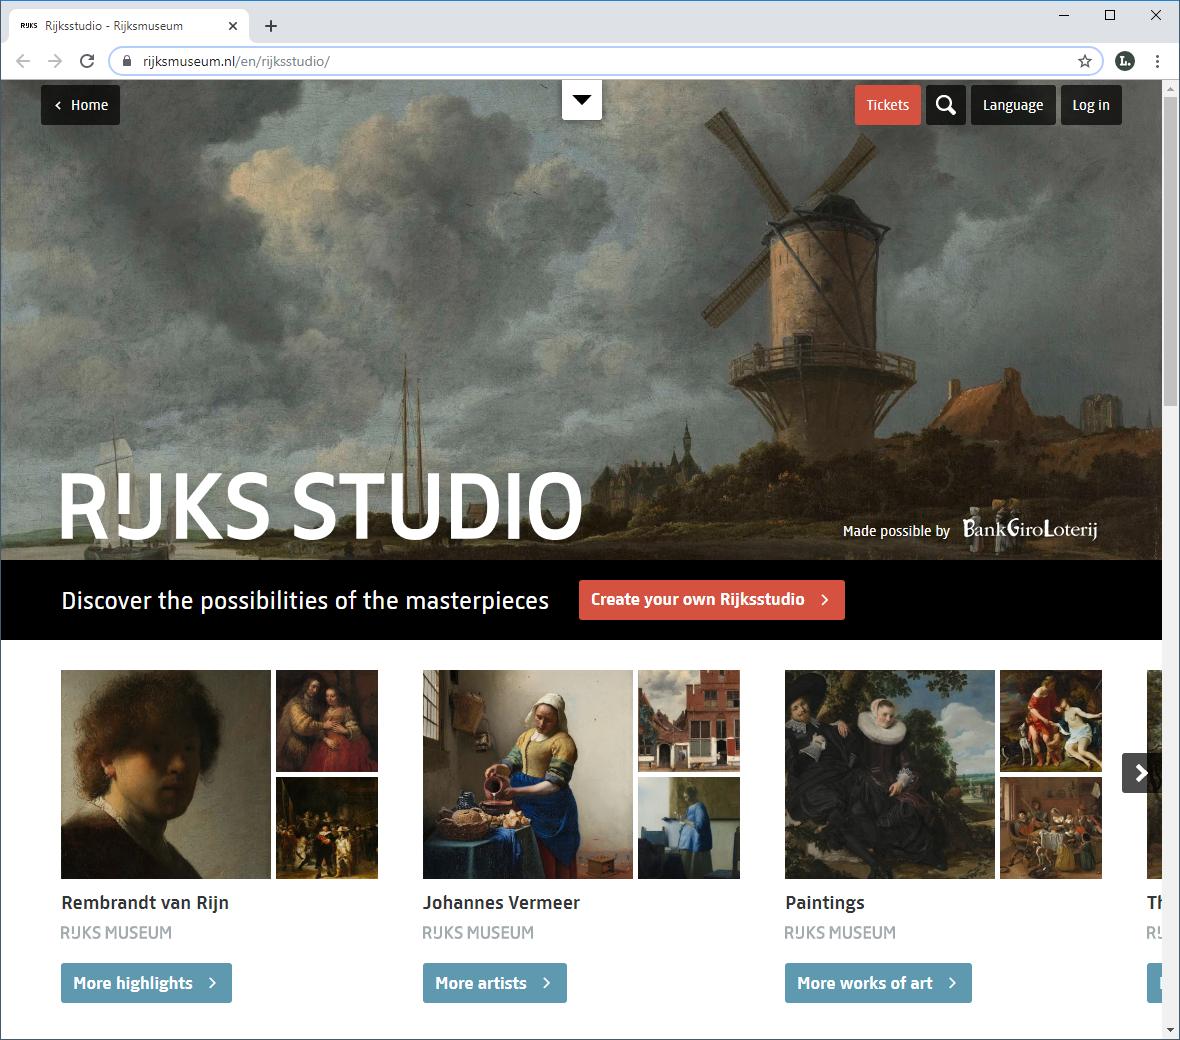 «Rijksstudio» des Rijksmuseum in Amsterdam